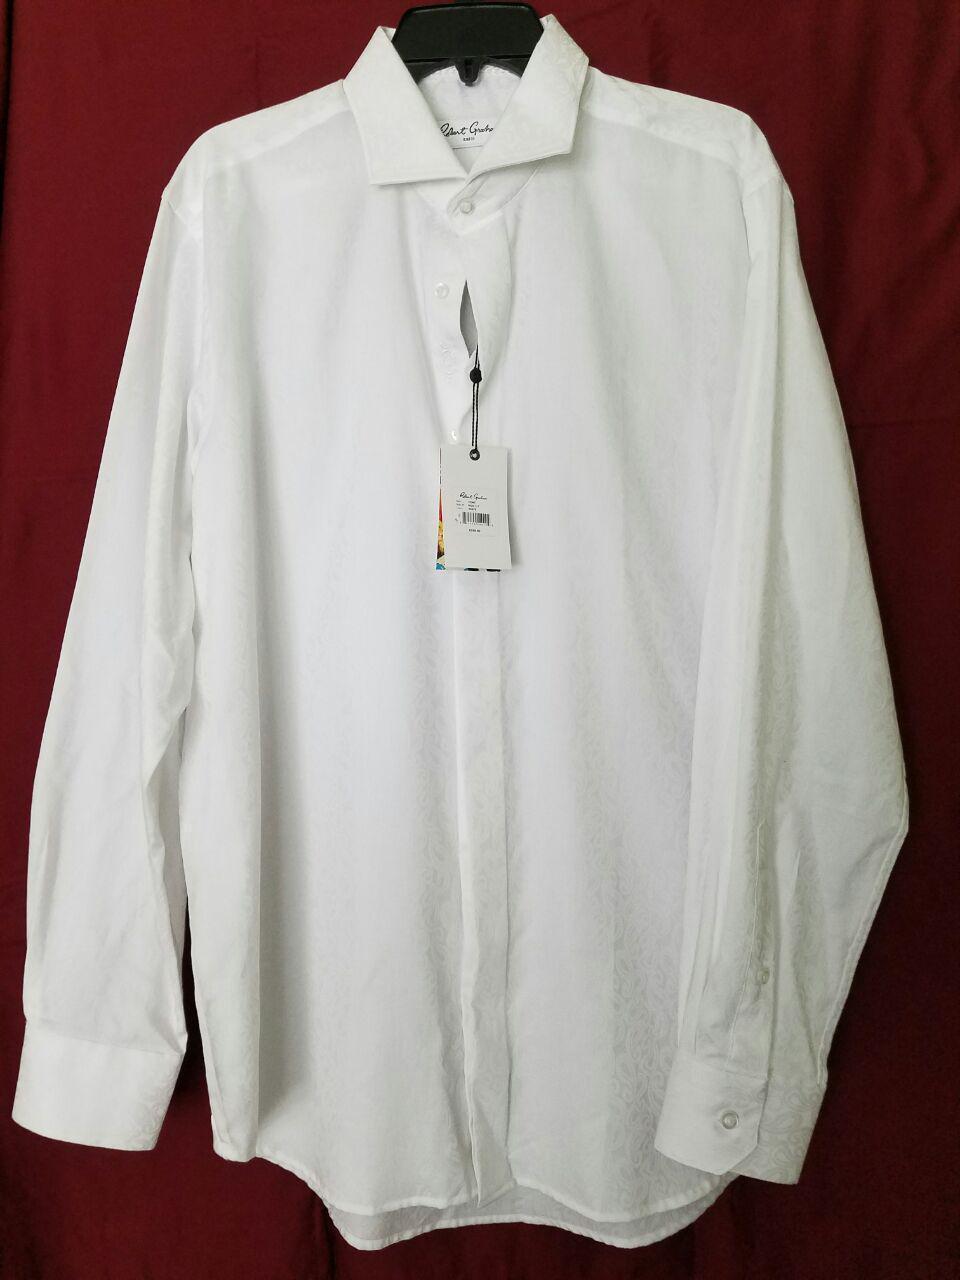 NWT Robert Graham Cont Dress Shirt RGD1217 White Size 43 17